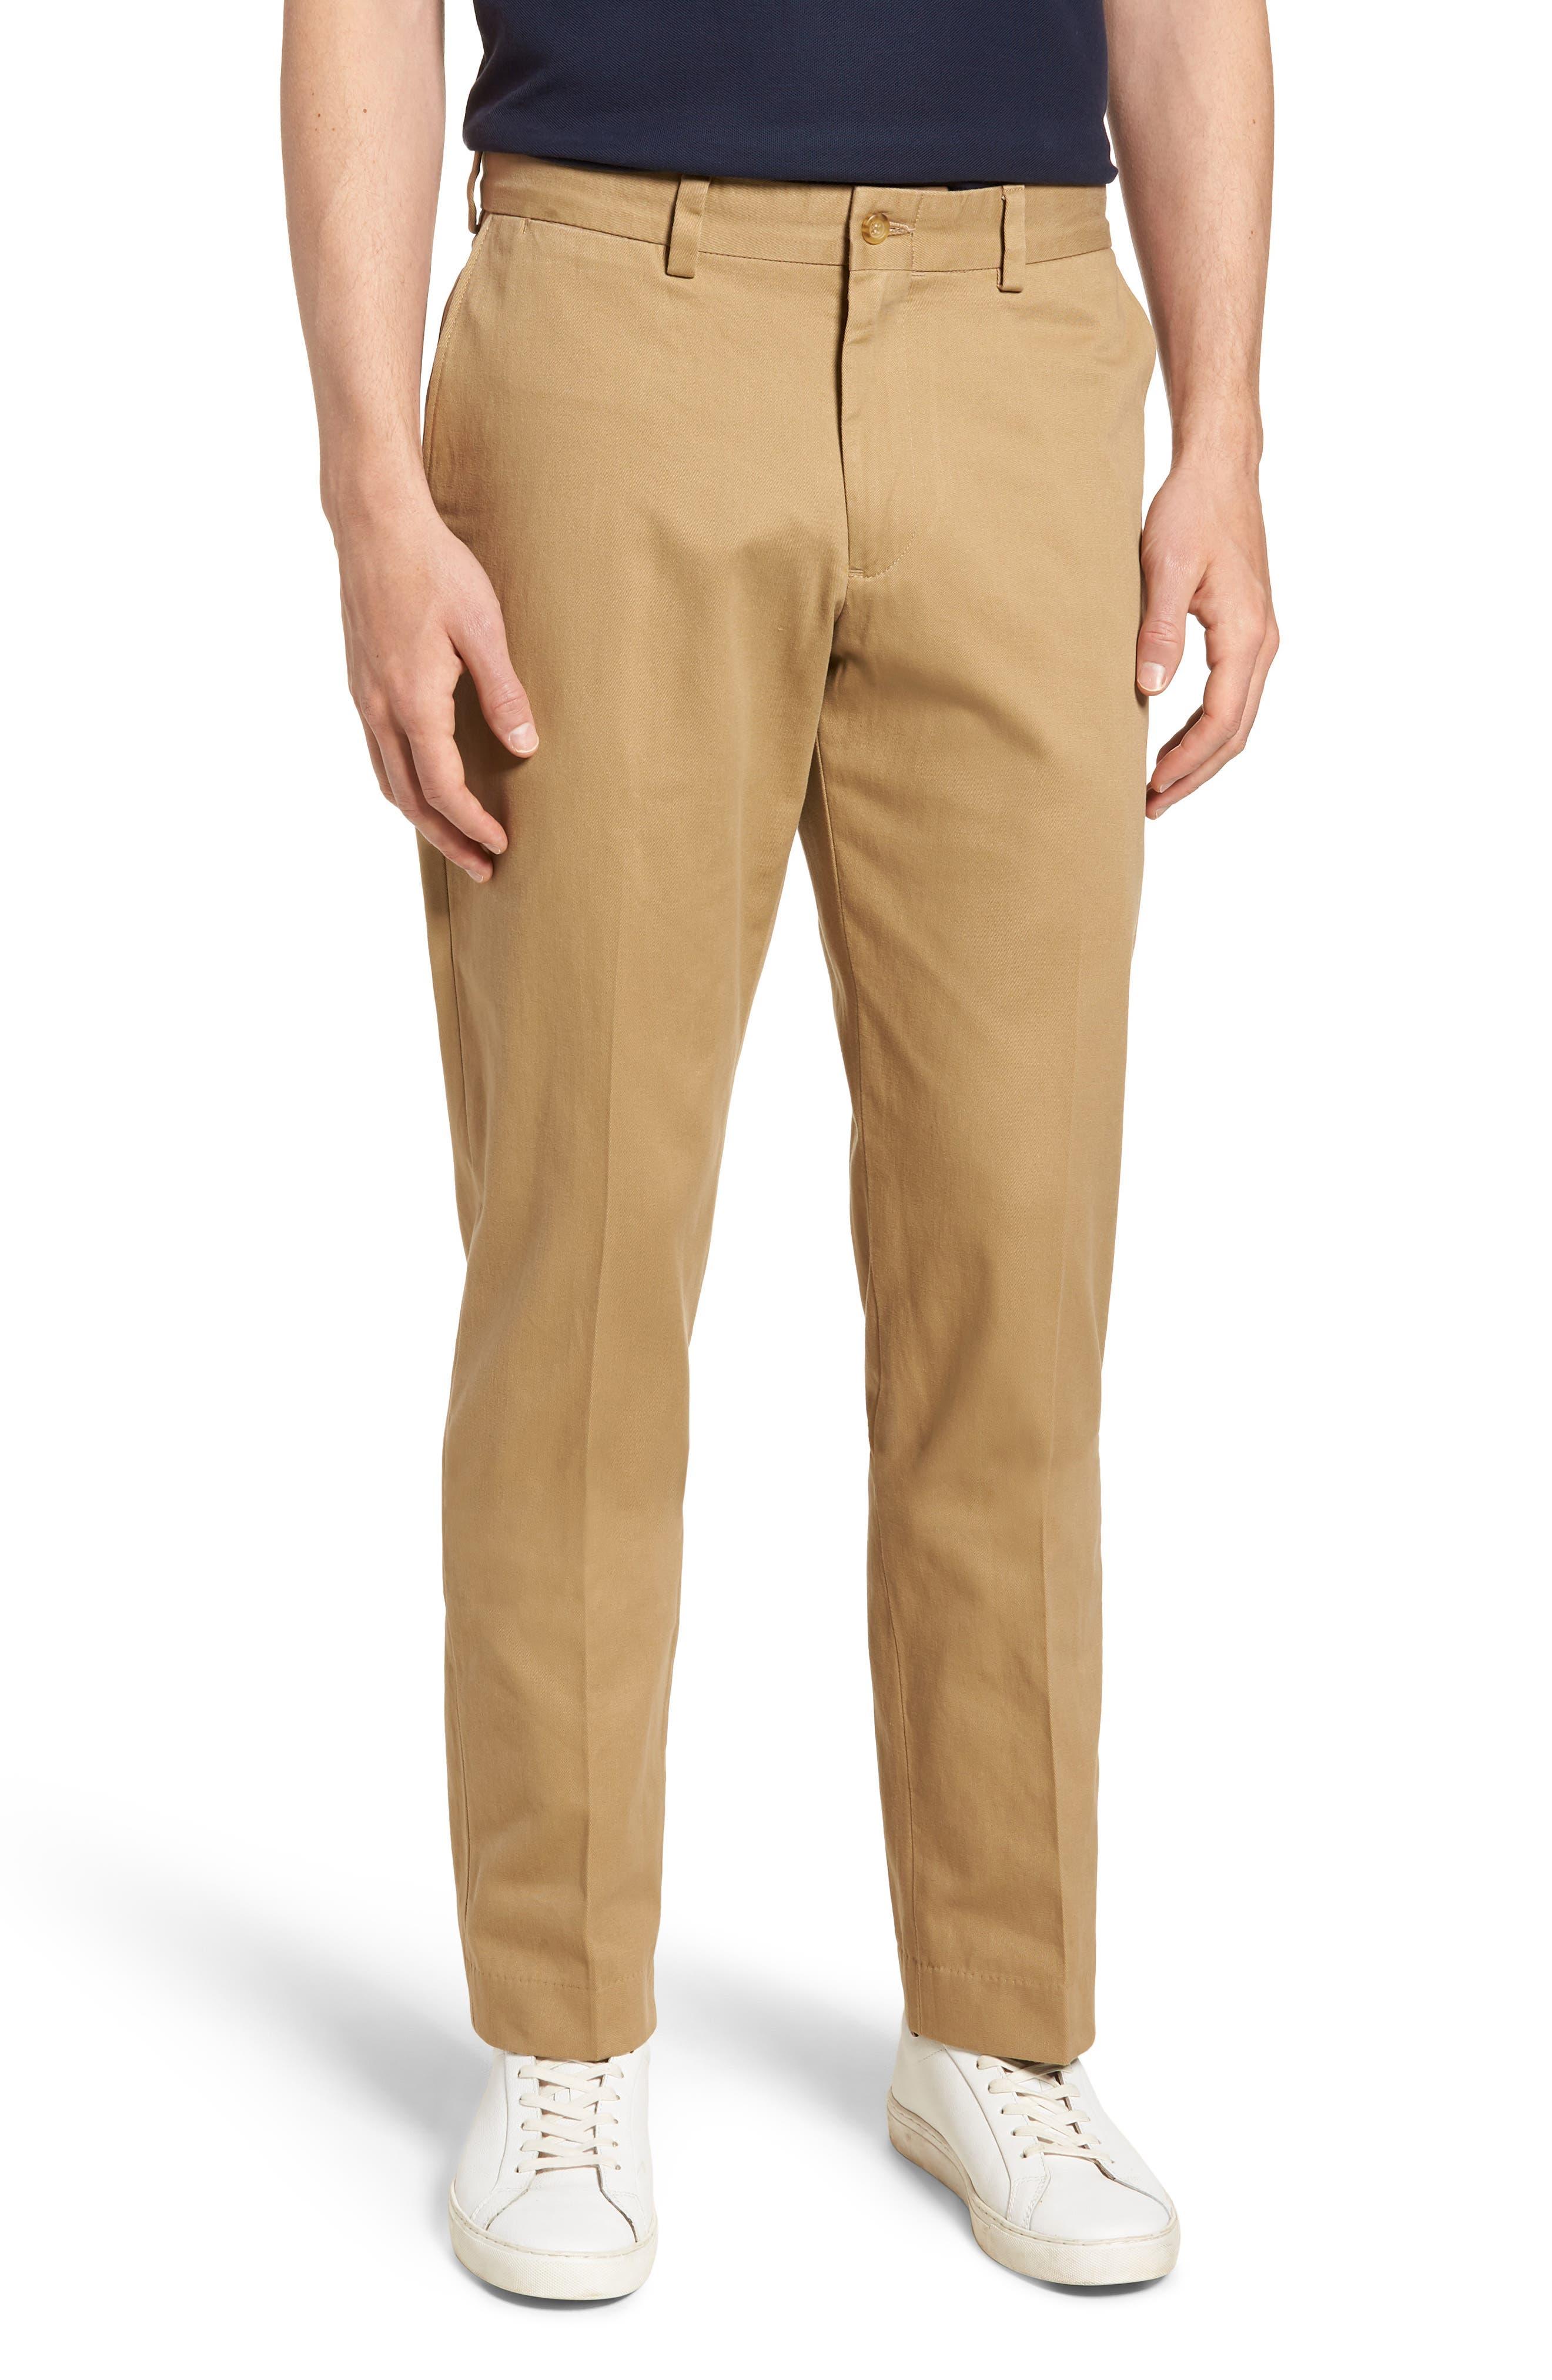 M3 Straight Fit Vintage Twill Flat Front Pants,                         Main,                         color, British Khaki